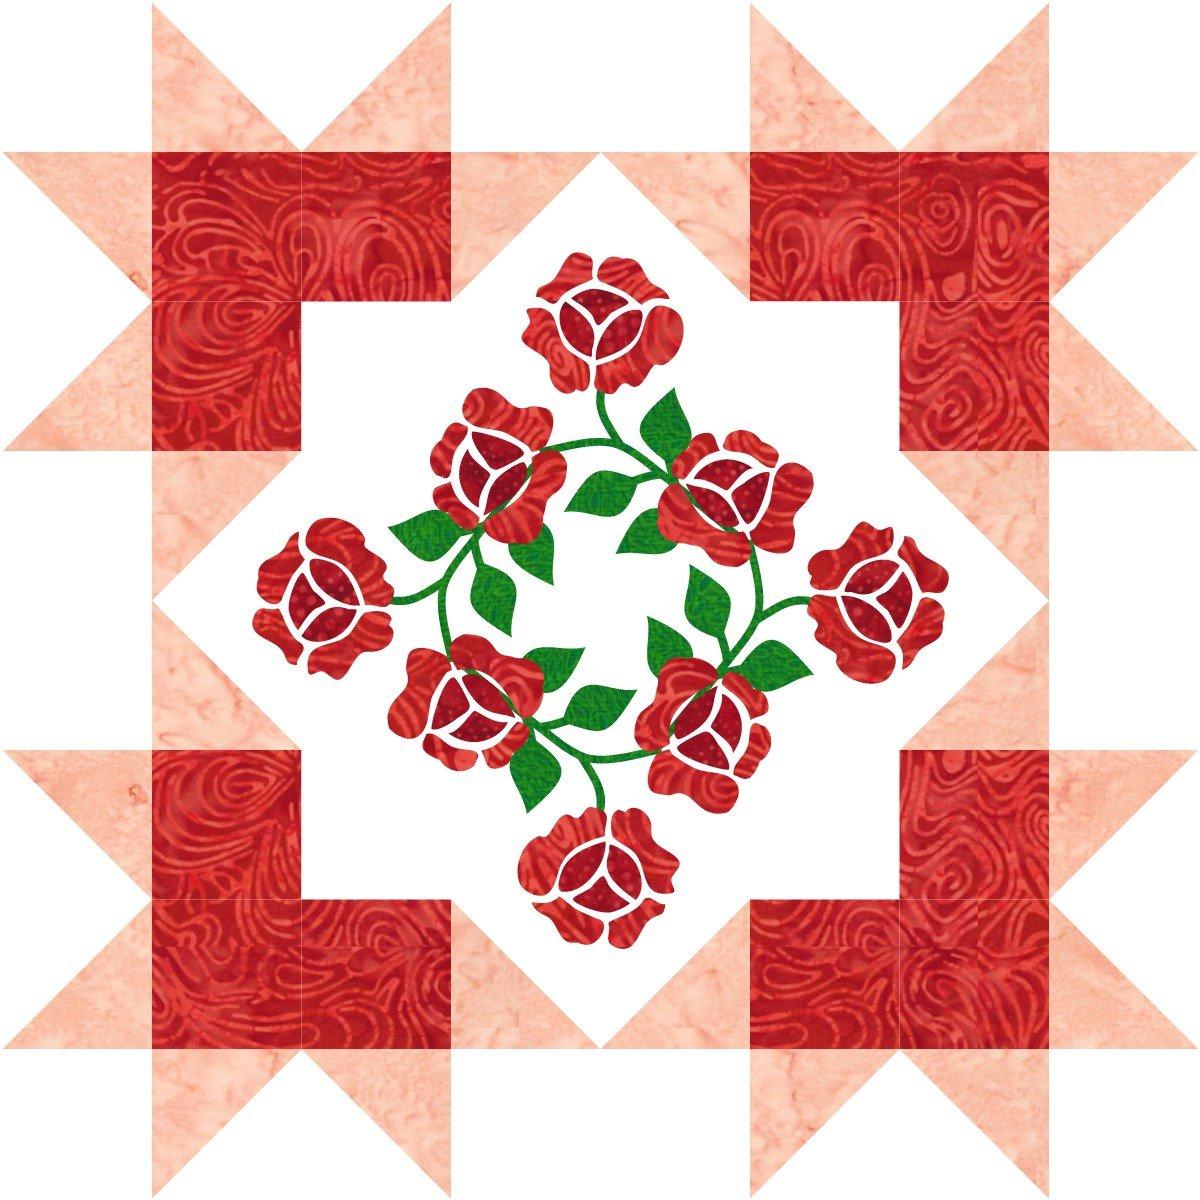 Starburst Blossoms Block 1:  Roses